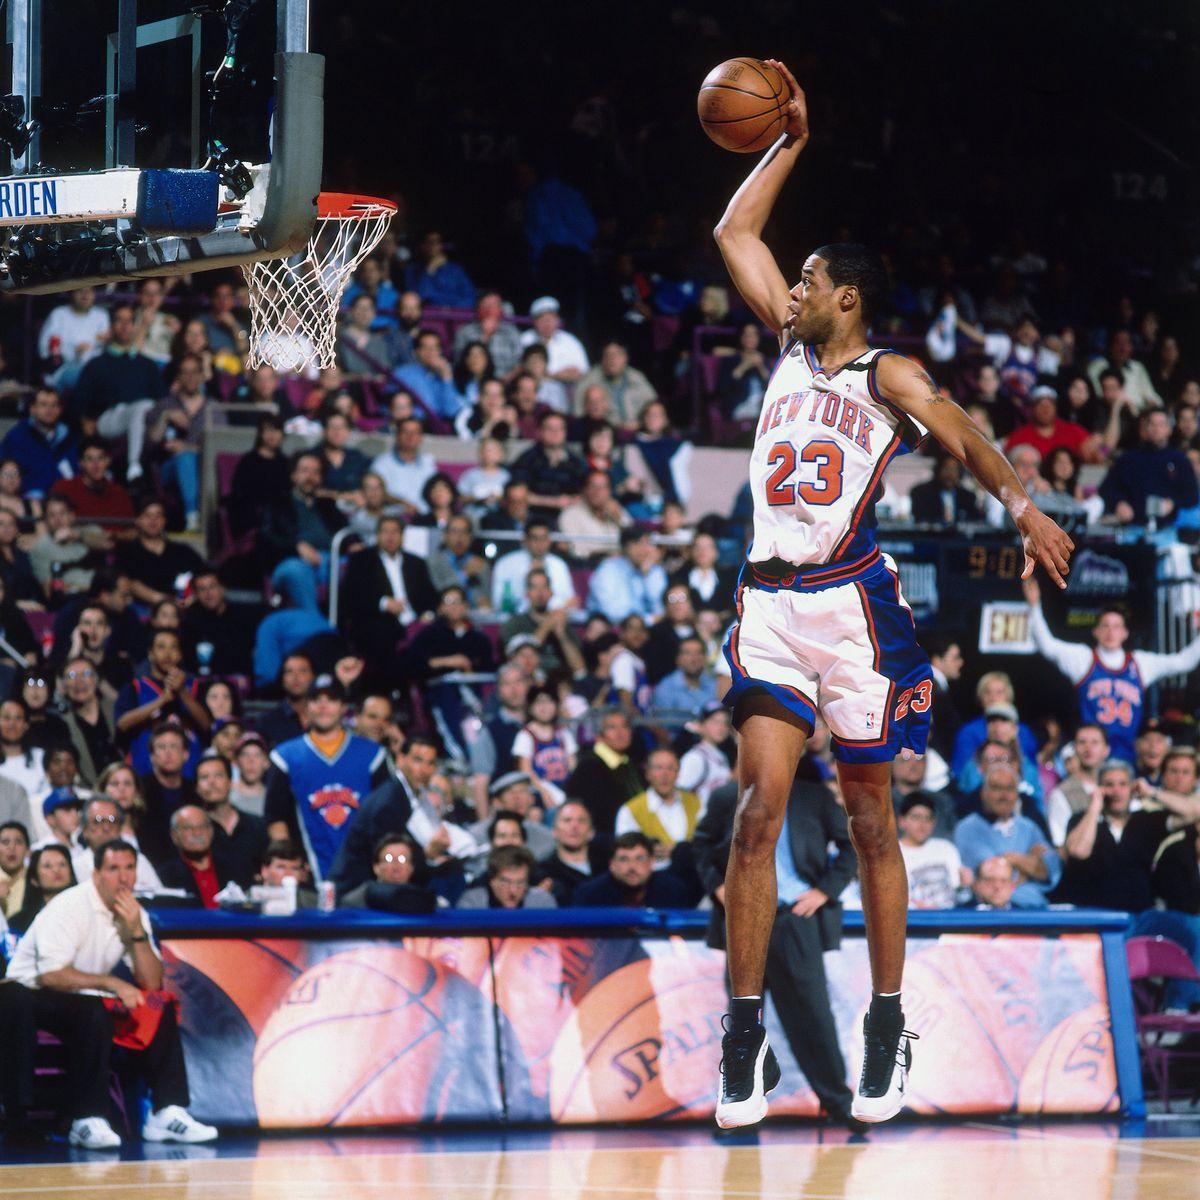 1999 Eastern Conference Semifinals, Game 3: Atlanta Hawks vs. New York Knicks